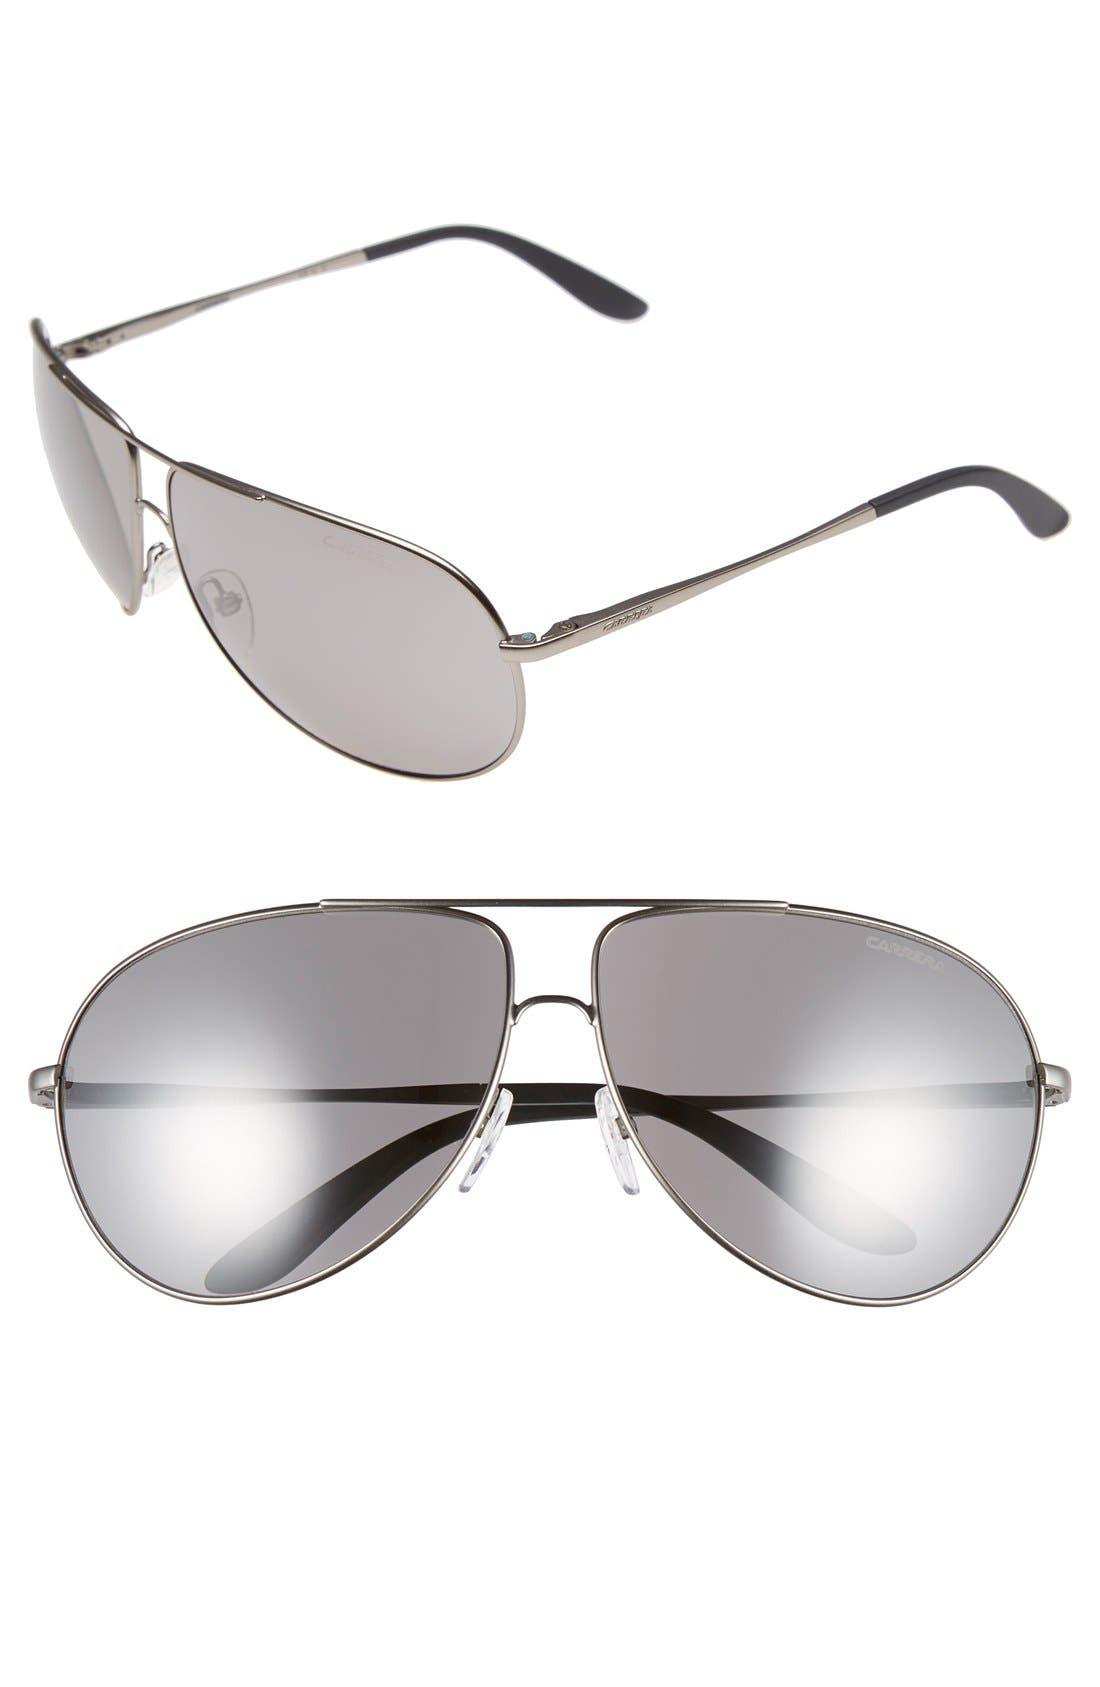 Carrera Eyewear 64mm Aviator Sunglasses